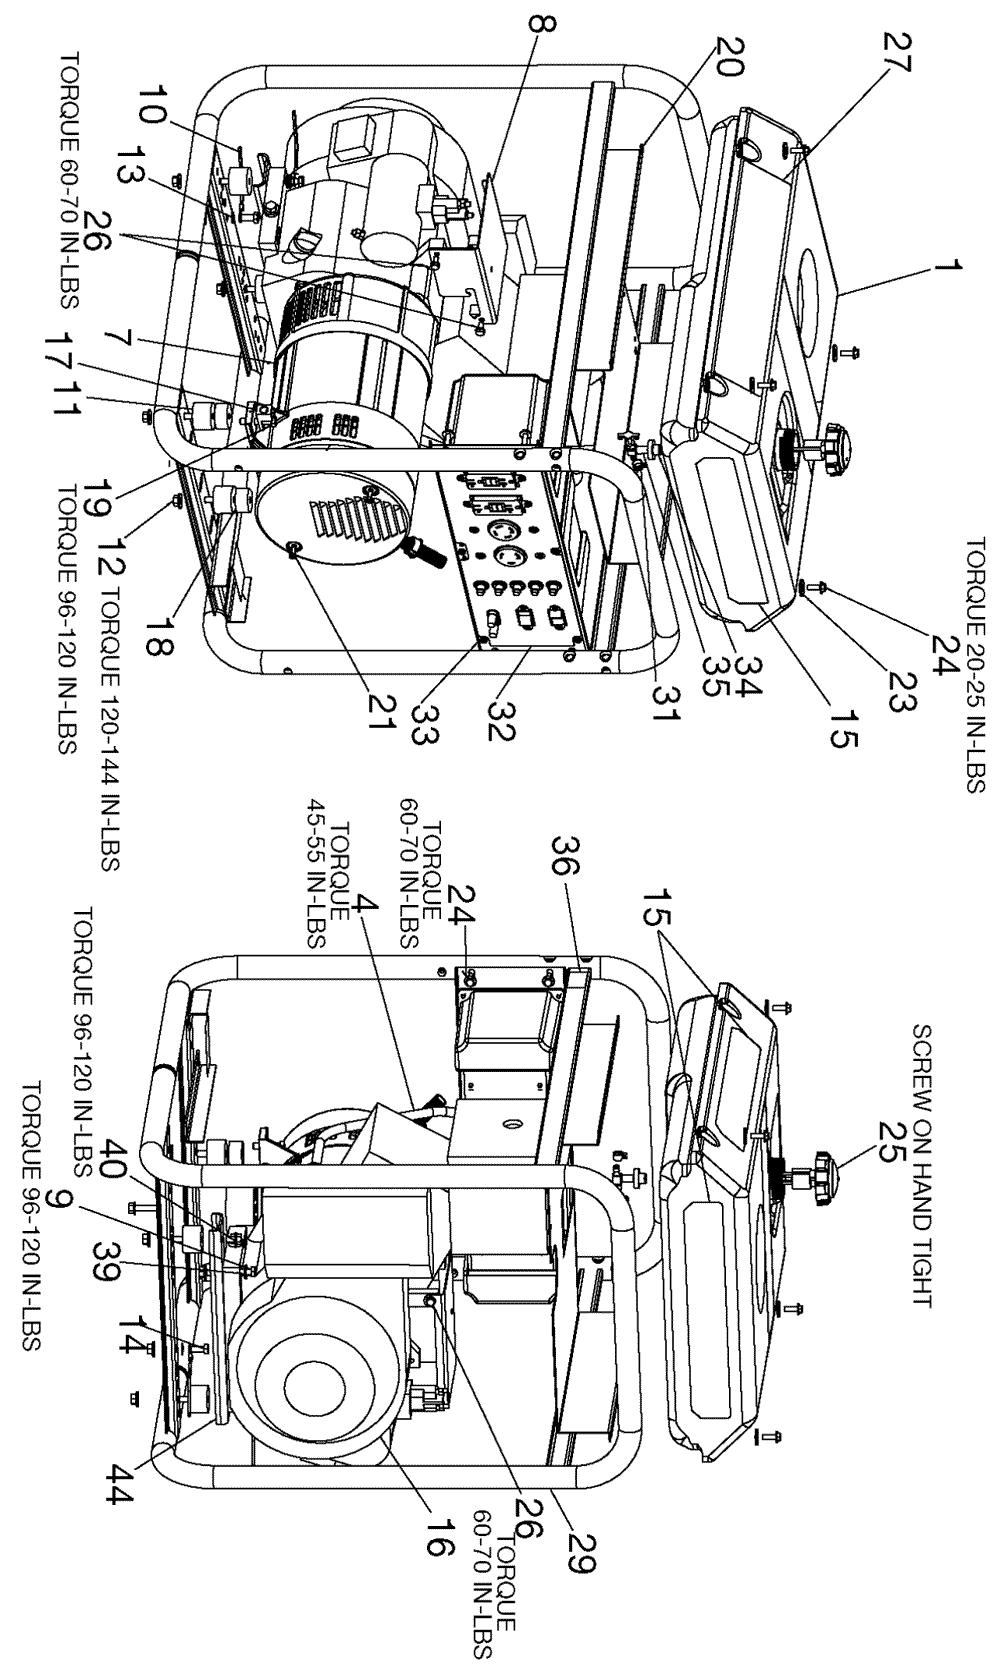 Wiring Diagram For Onan Generator 7500 Watt Porter Cable